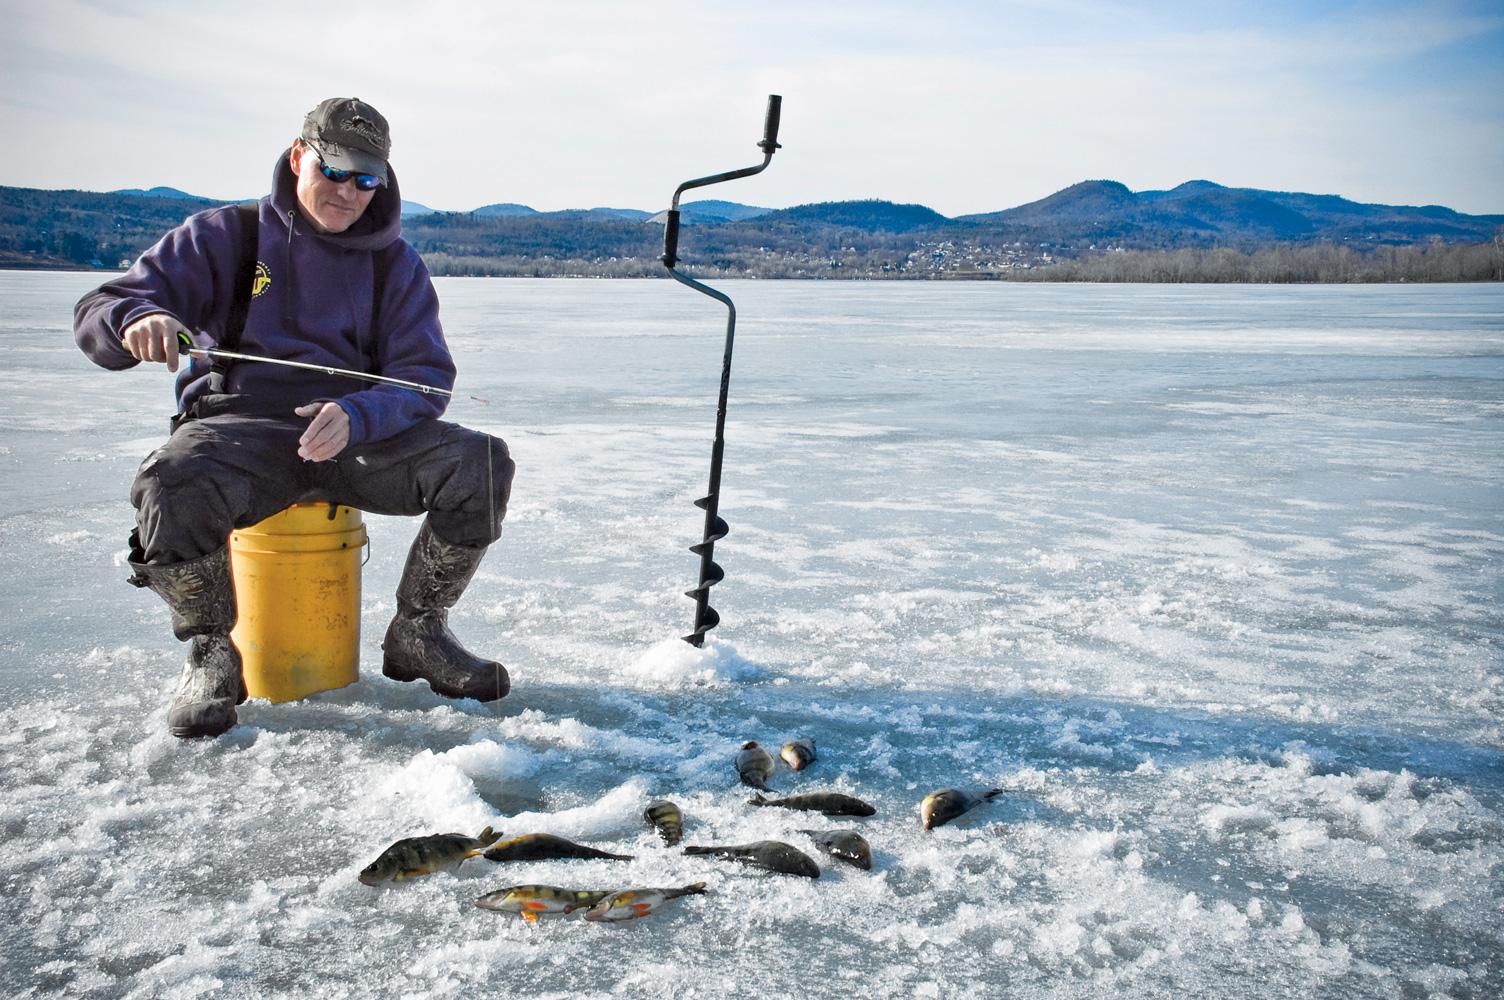 Adirondack Life Article - Gold under the Ice